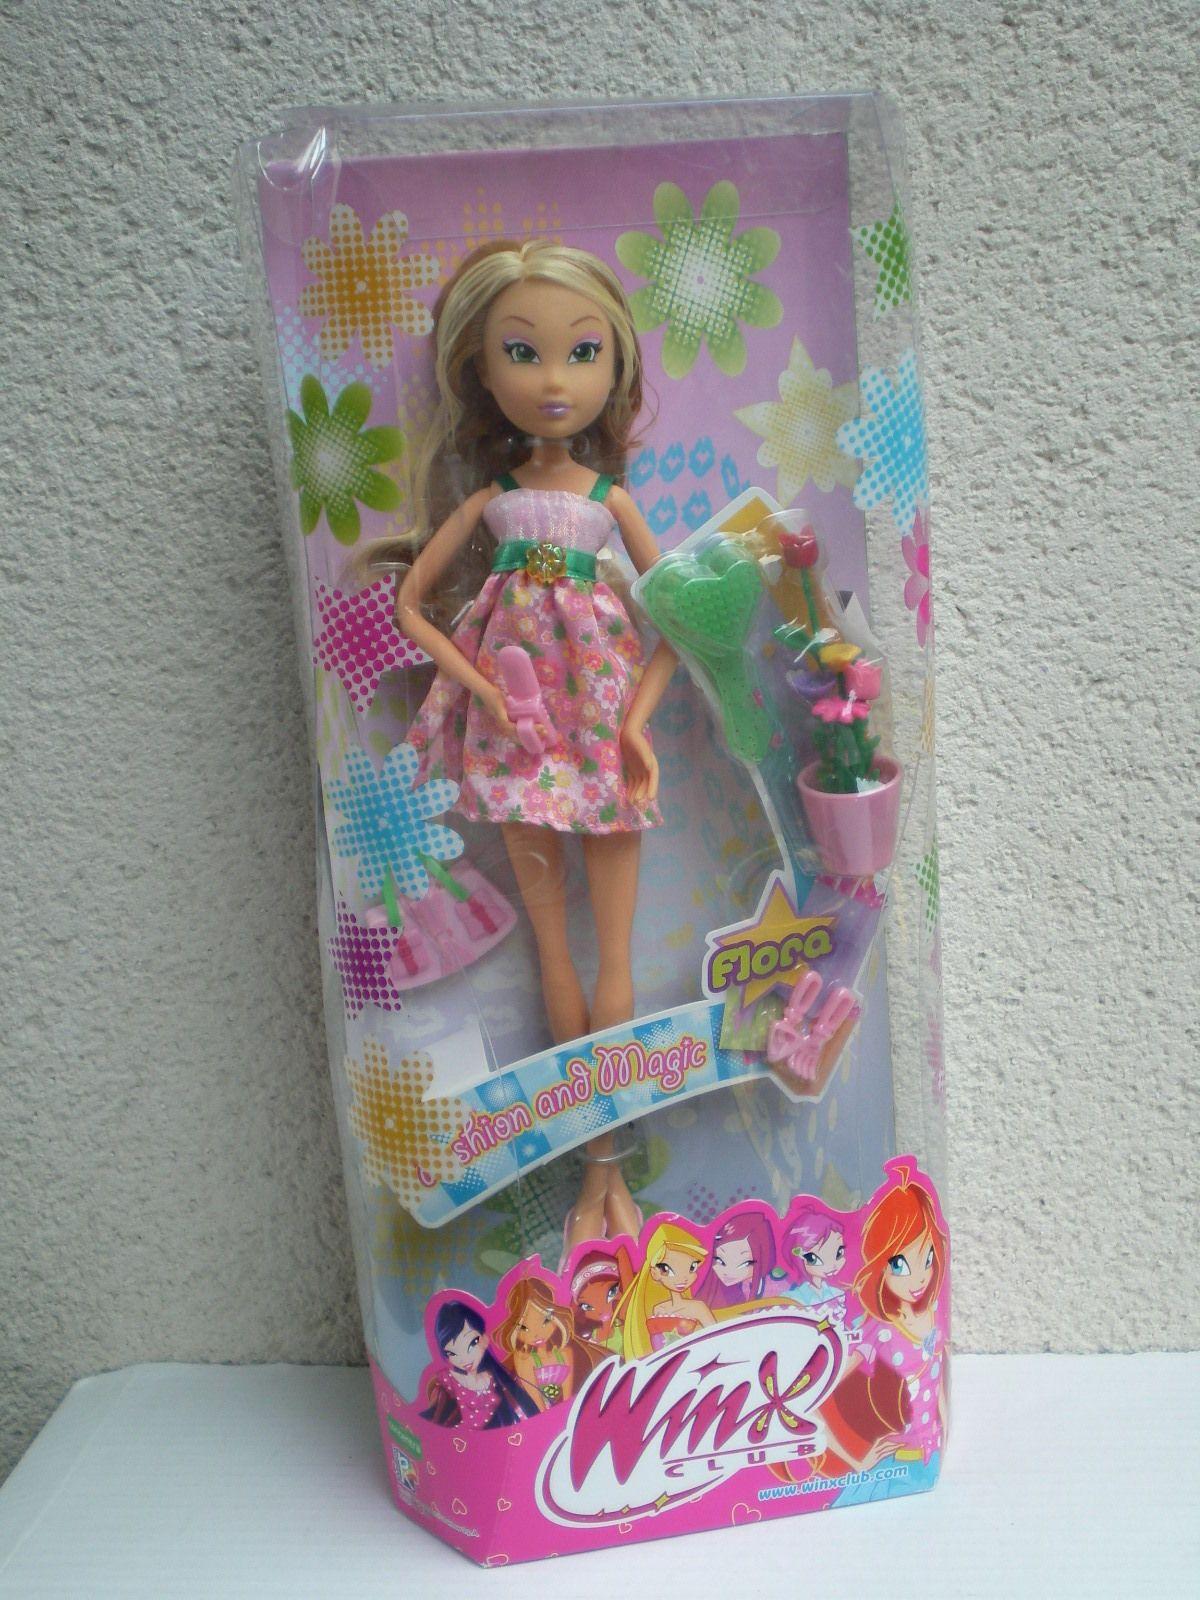 Rare Winx Club Flora Doll Fashion Magic Ebay Winx Club Winx